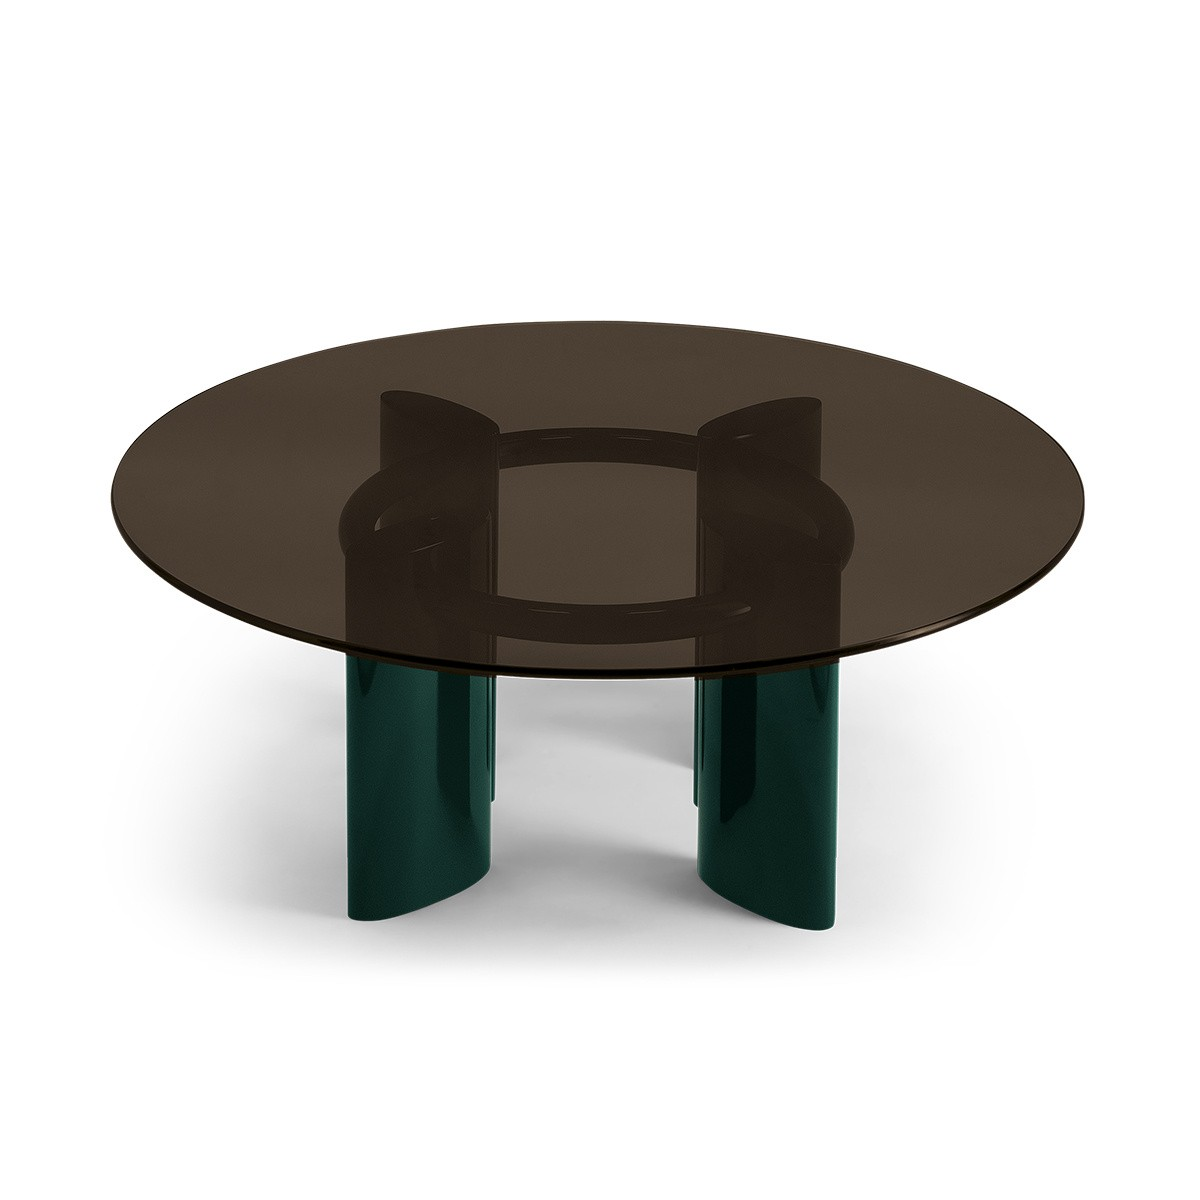 Carlotta Coffee Table, Smoked Glass Top and Green Legs